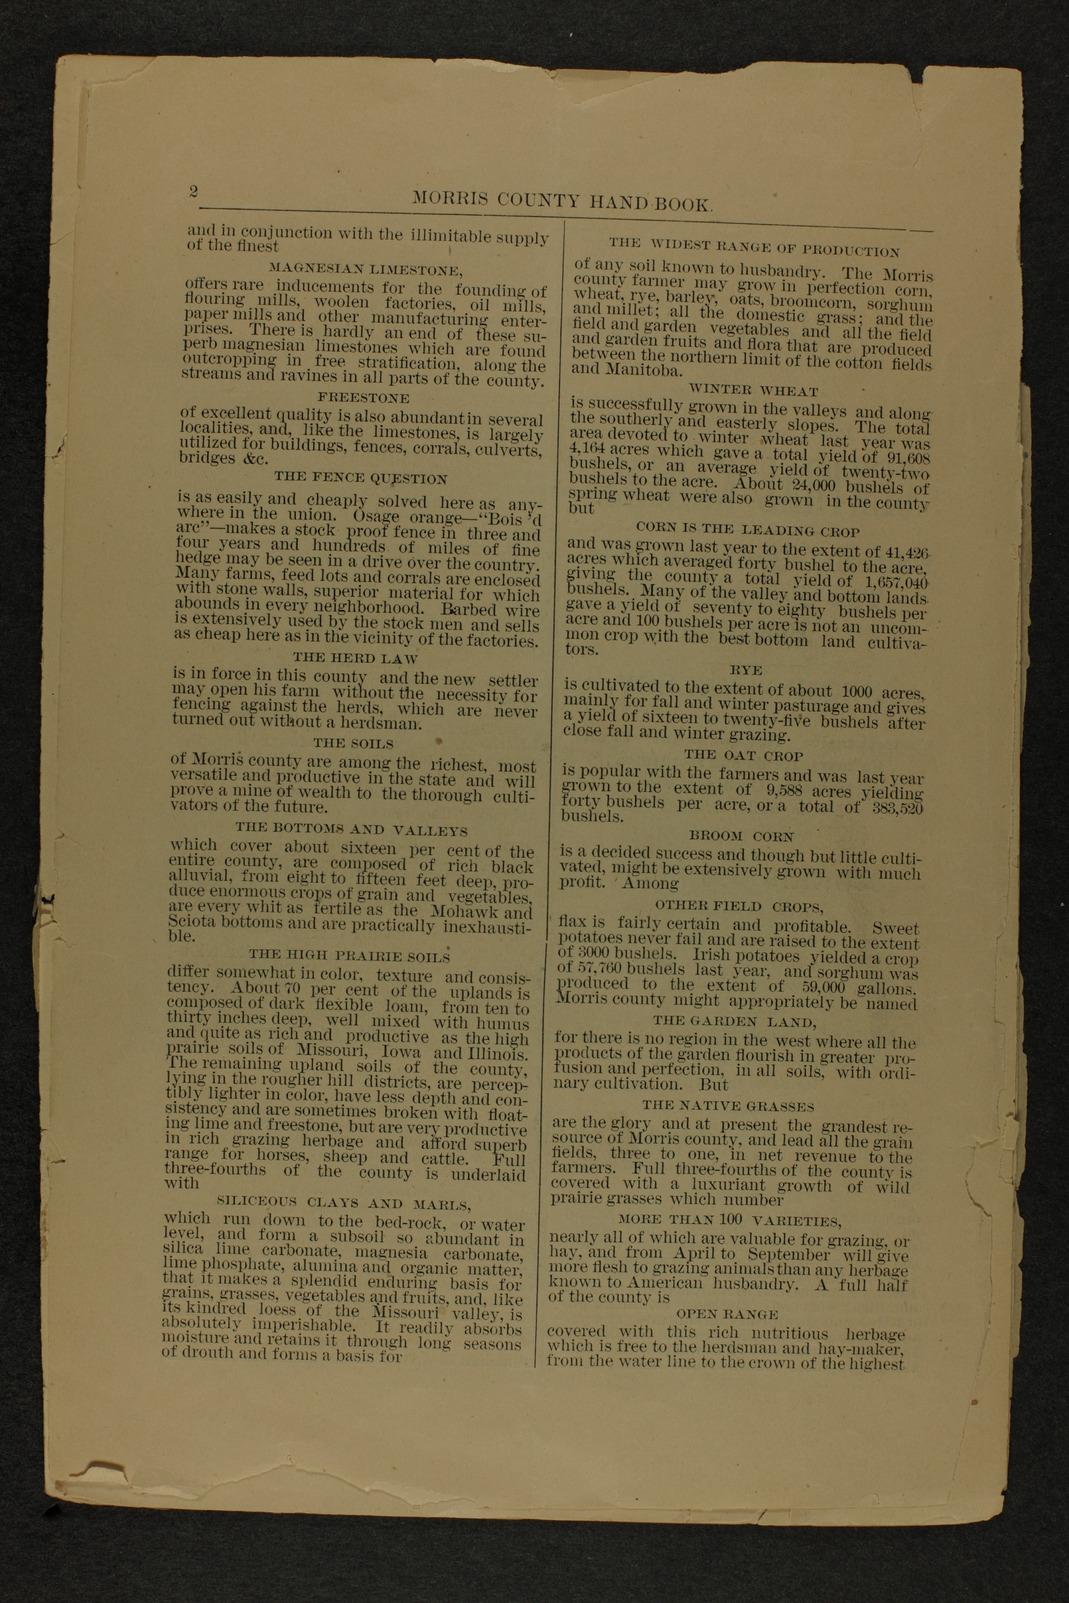 Handbook of Morris County, Kansas - 2